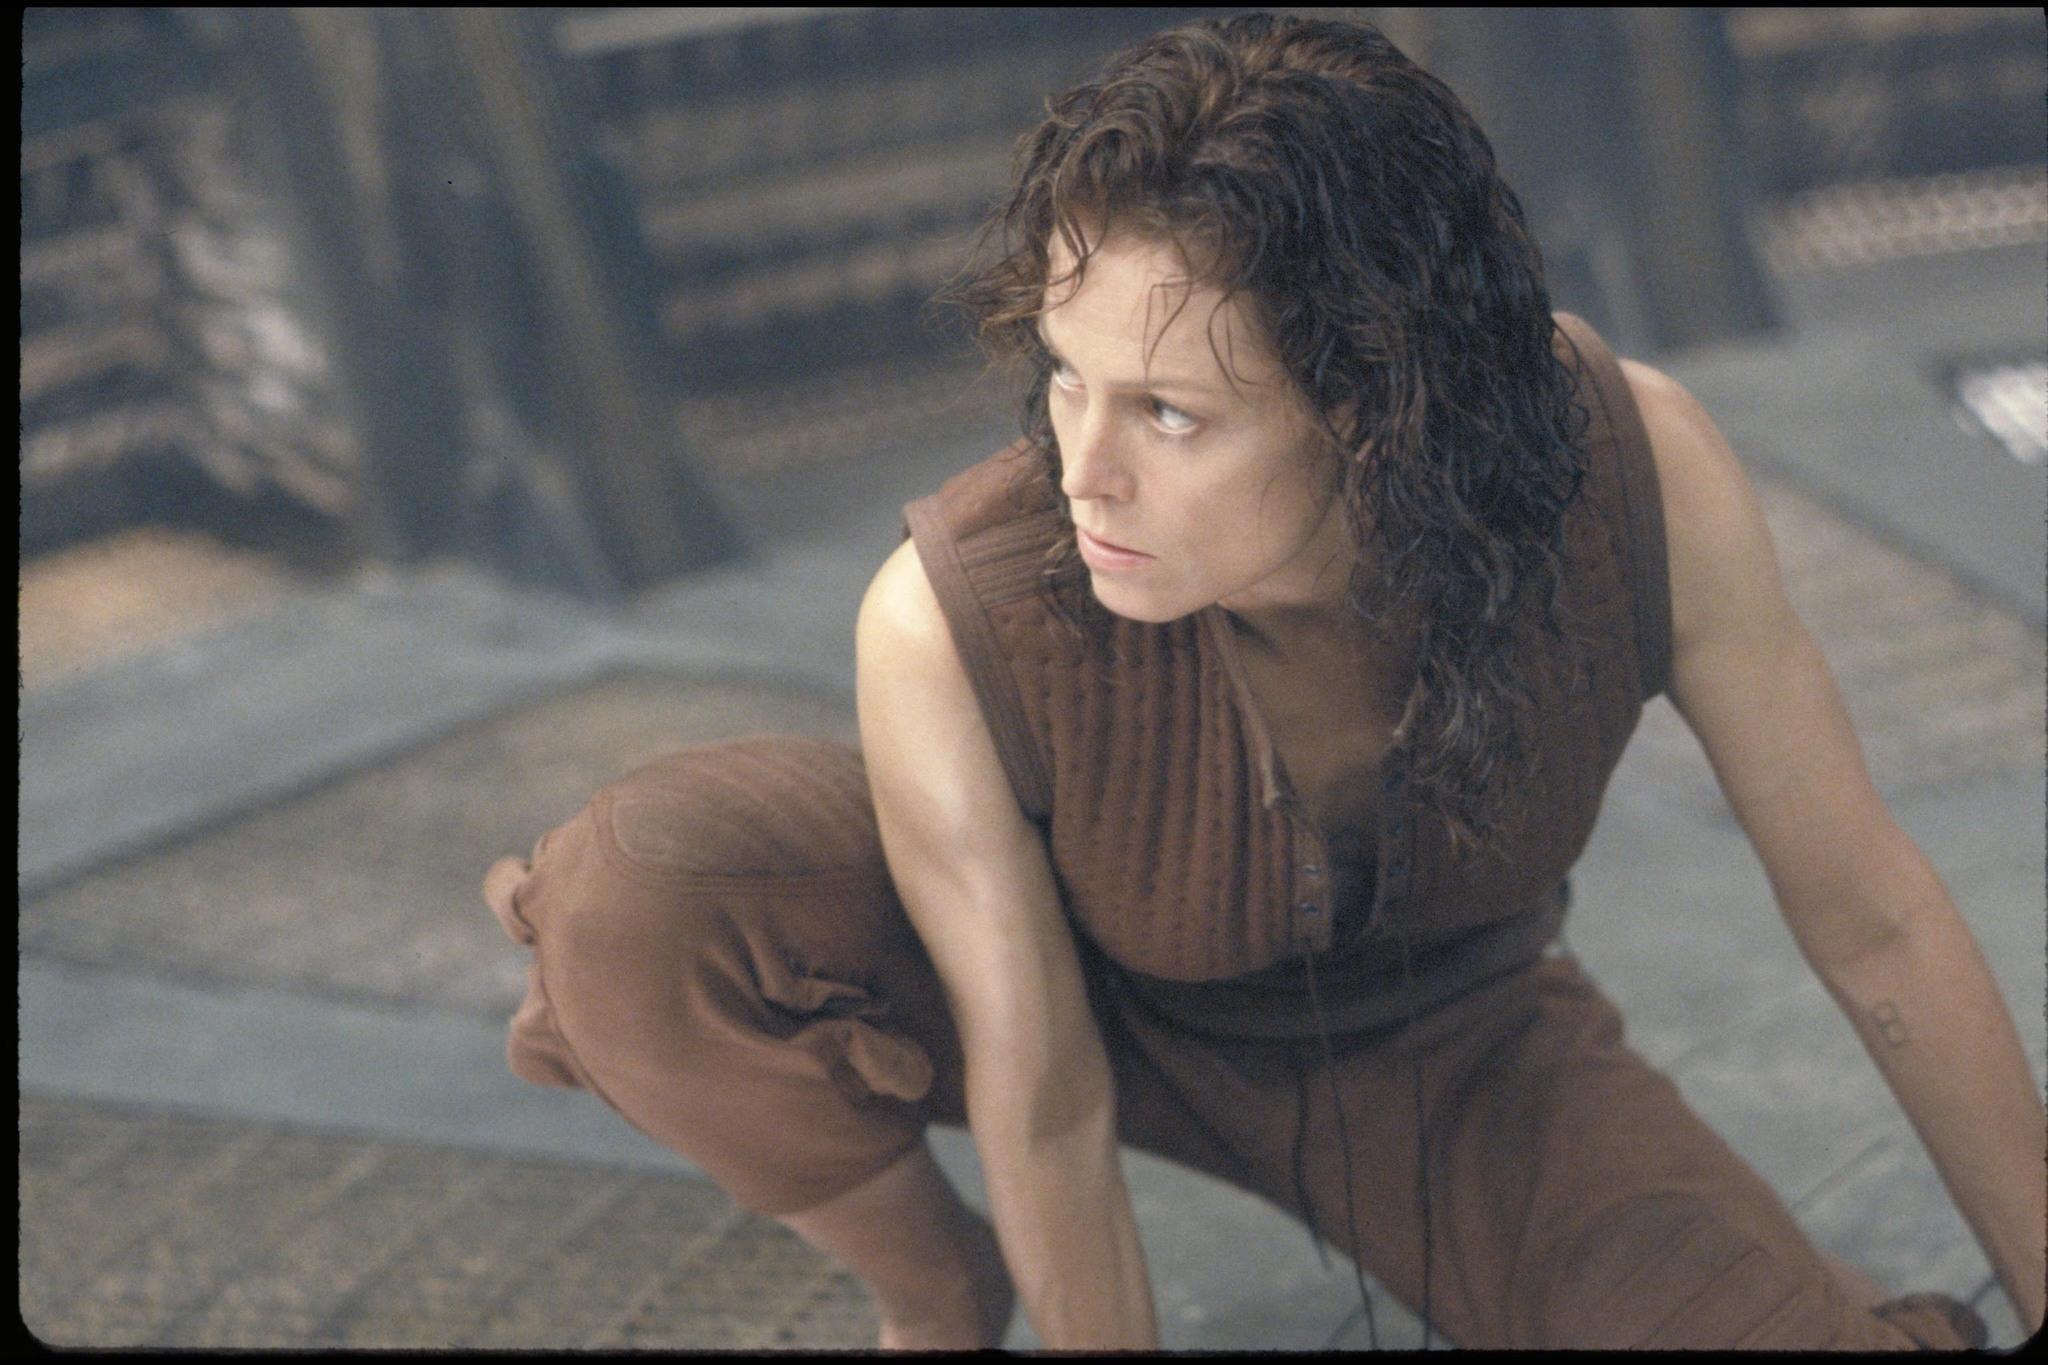 Pin Still Of Sigourney Weaver In Alien Resurrection 1997 -5673